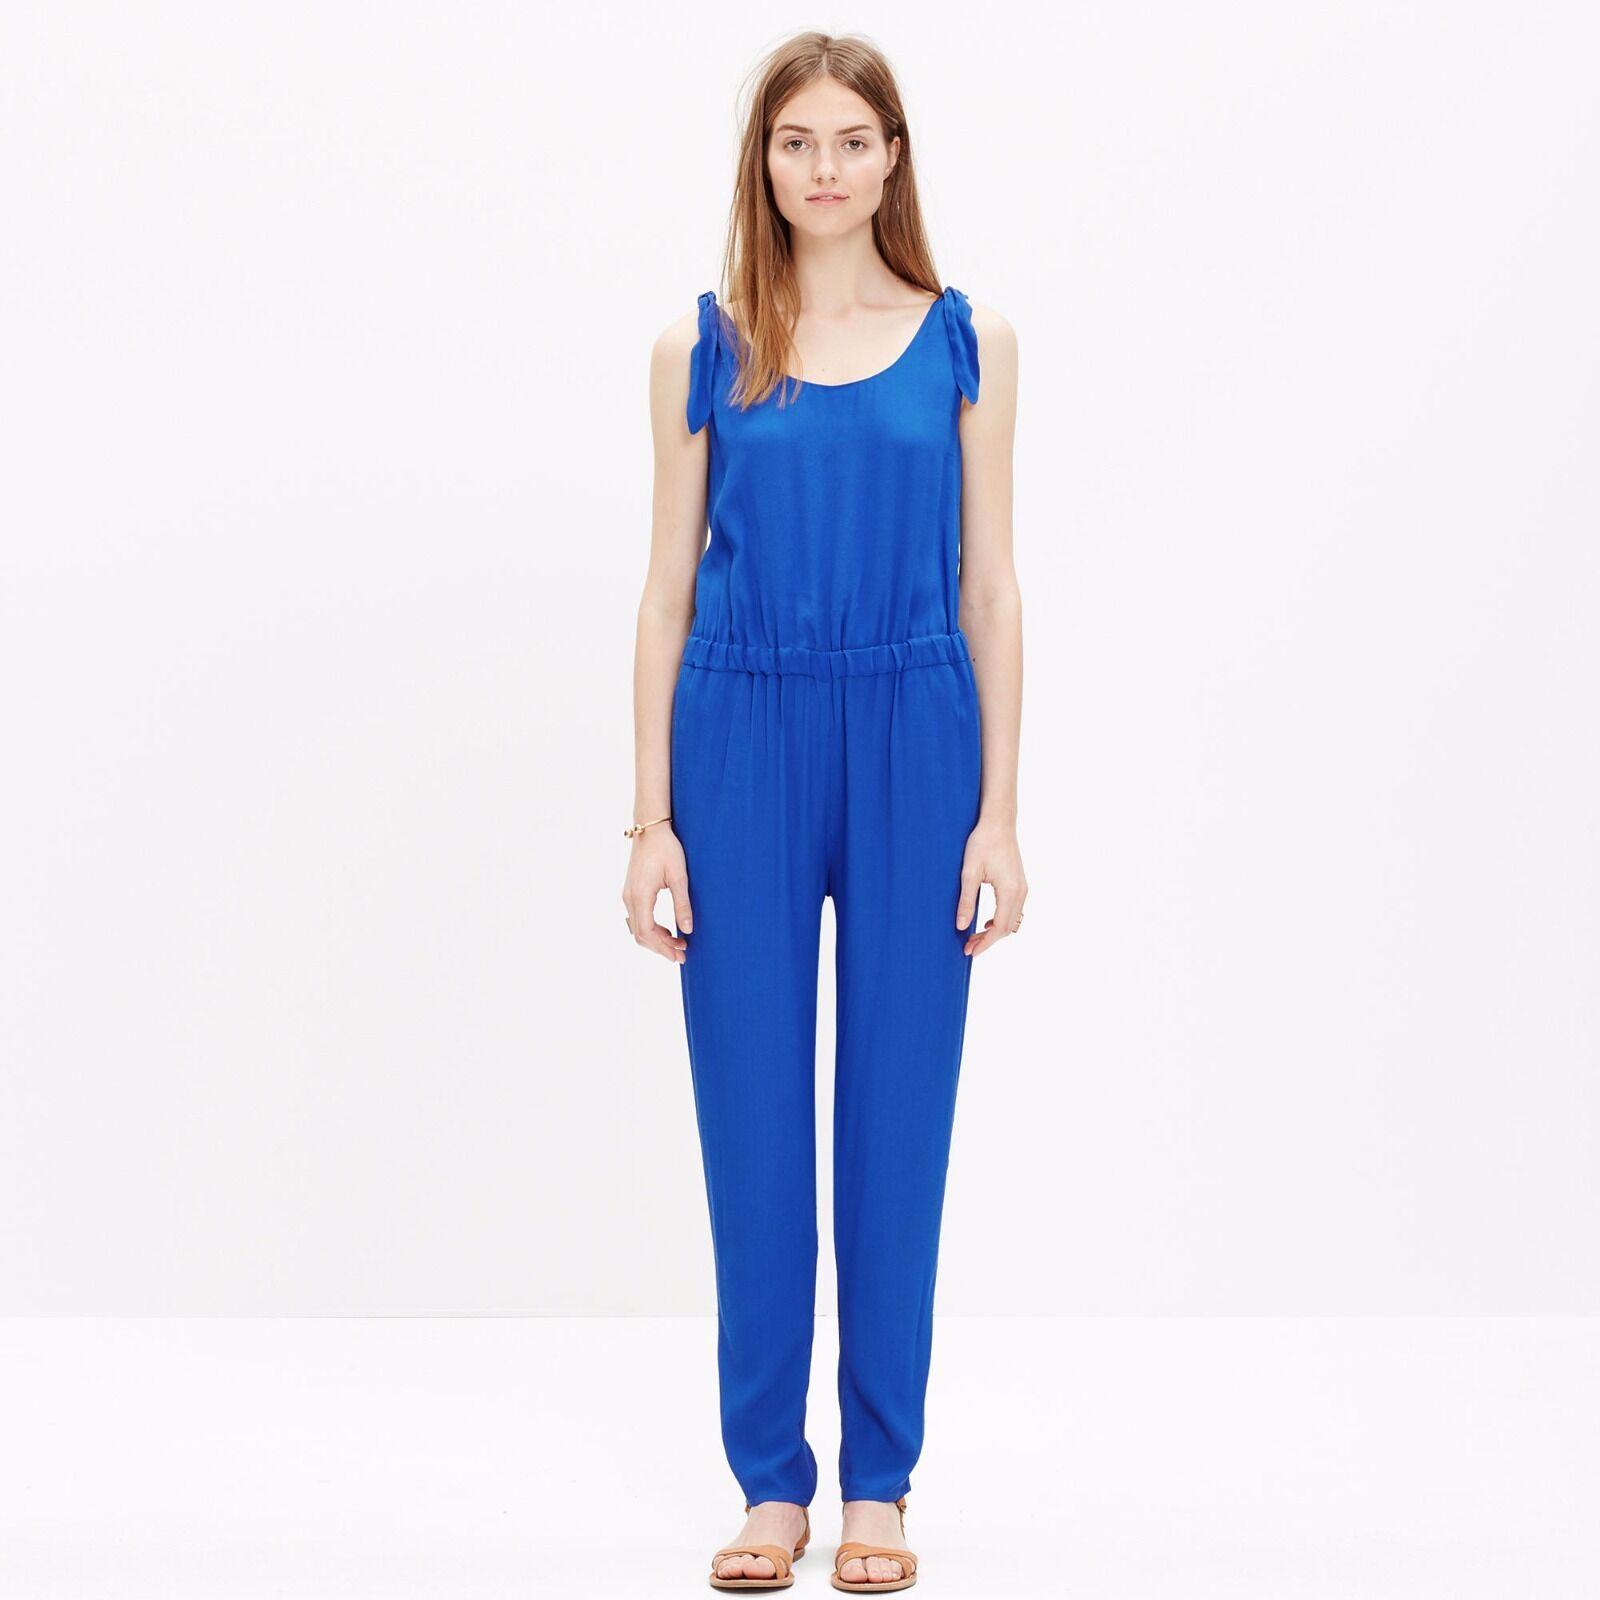 Madewell summer shoulder-tie jumpsuit Blau XS